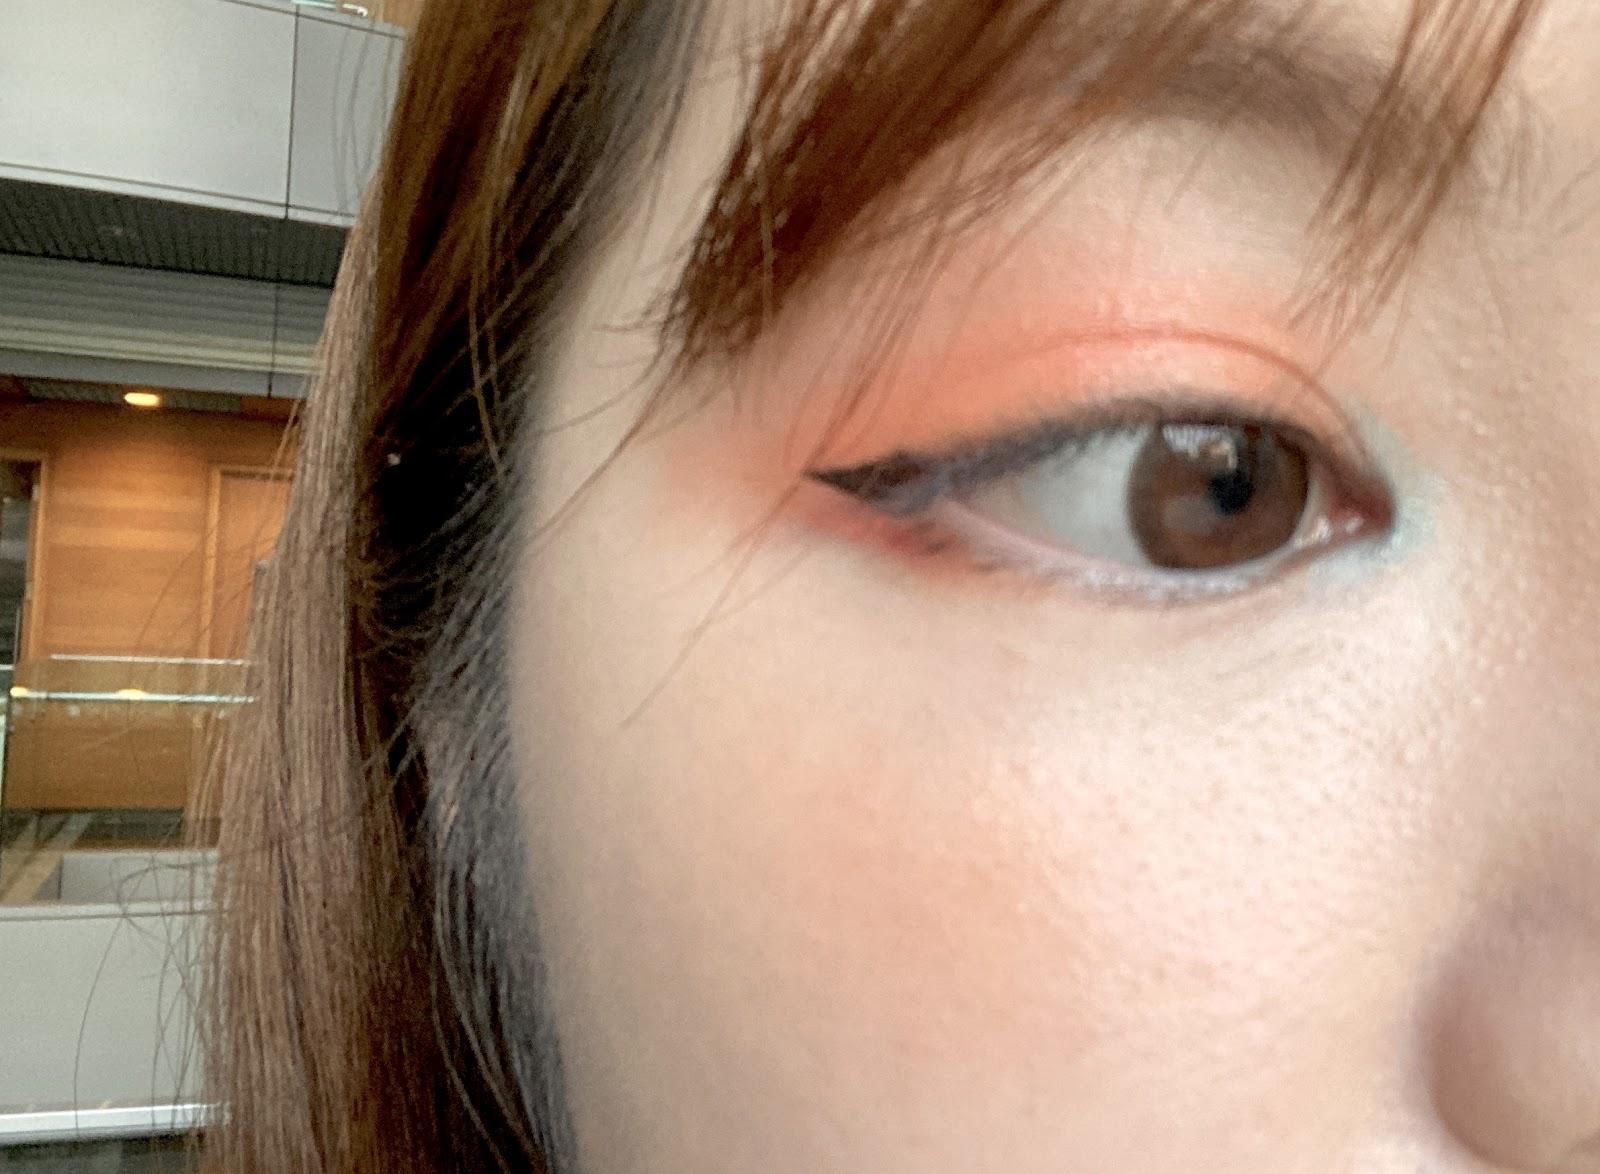 Lunasol hk 眼影盤 評測 香港 2020 好用 評價 用後感 推薦 Kanebo